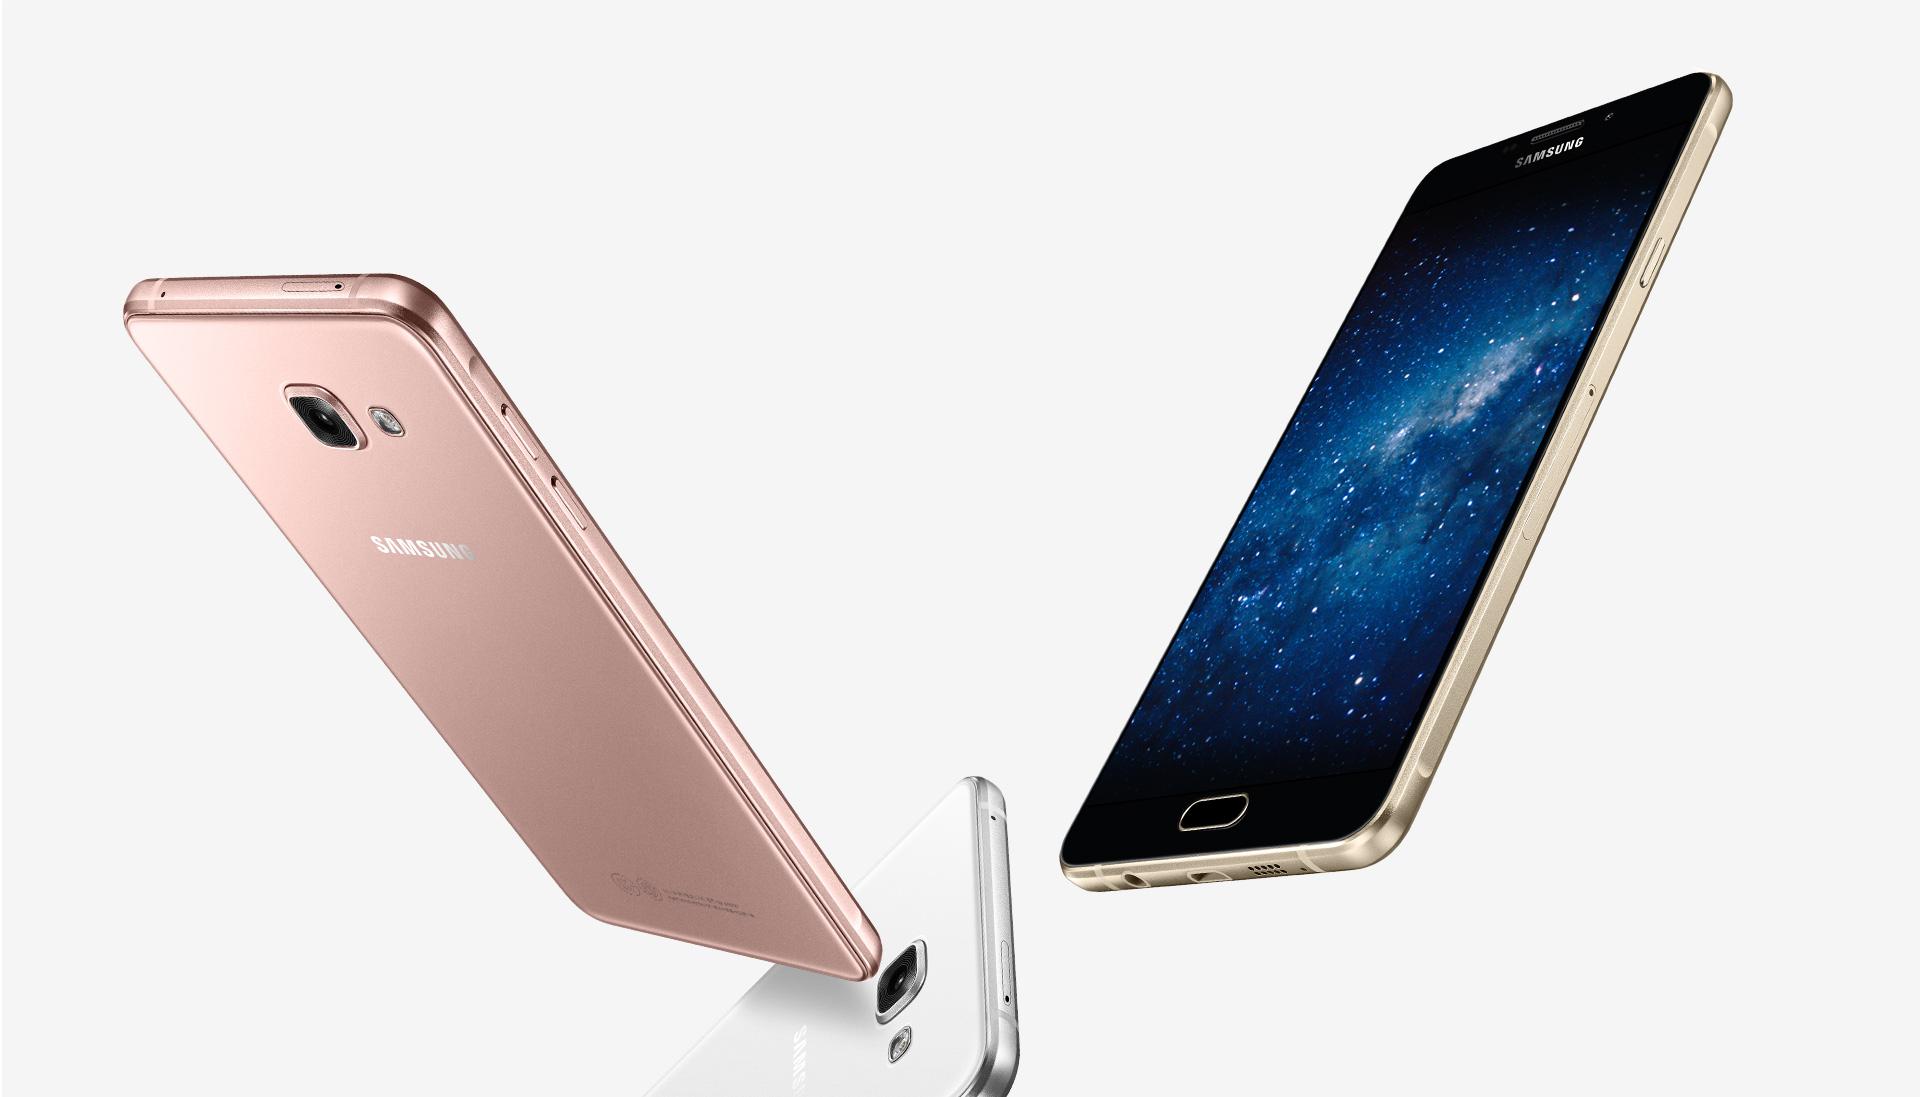 Galaxy A9 Pro international version